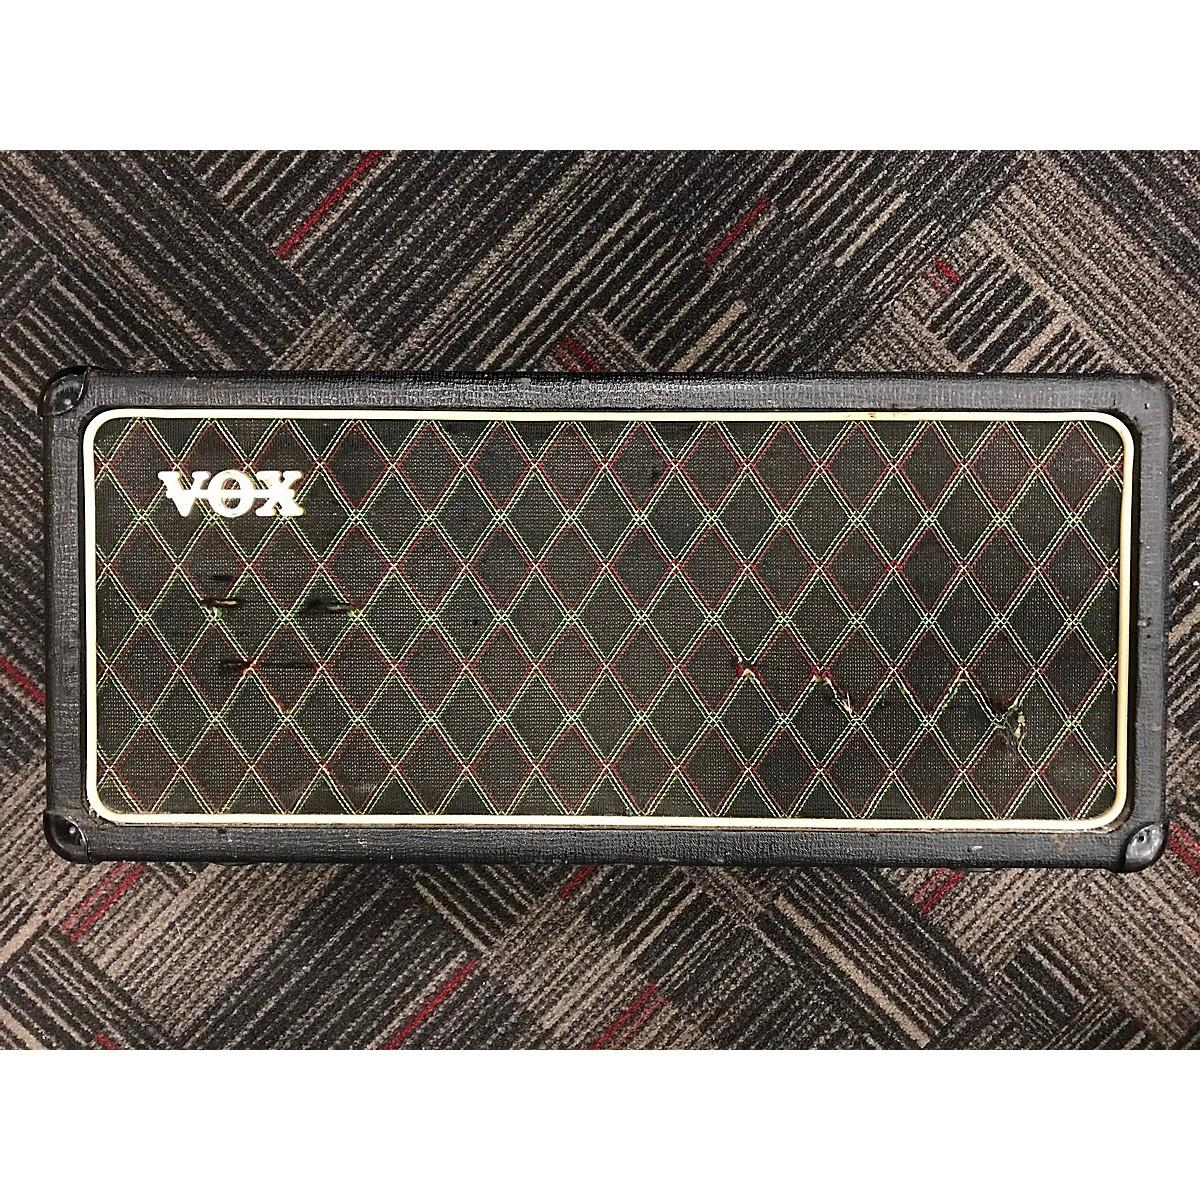 Vox 1966 AC50 Tube Guitar Amp Head